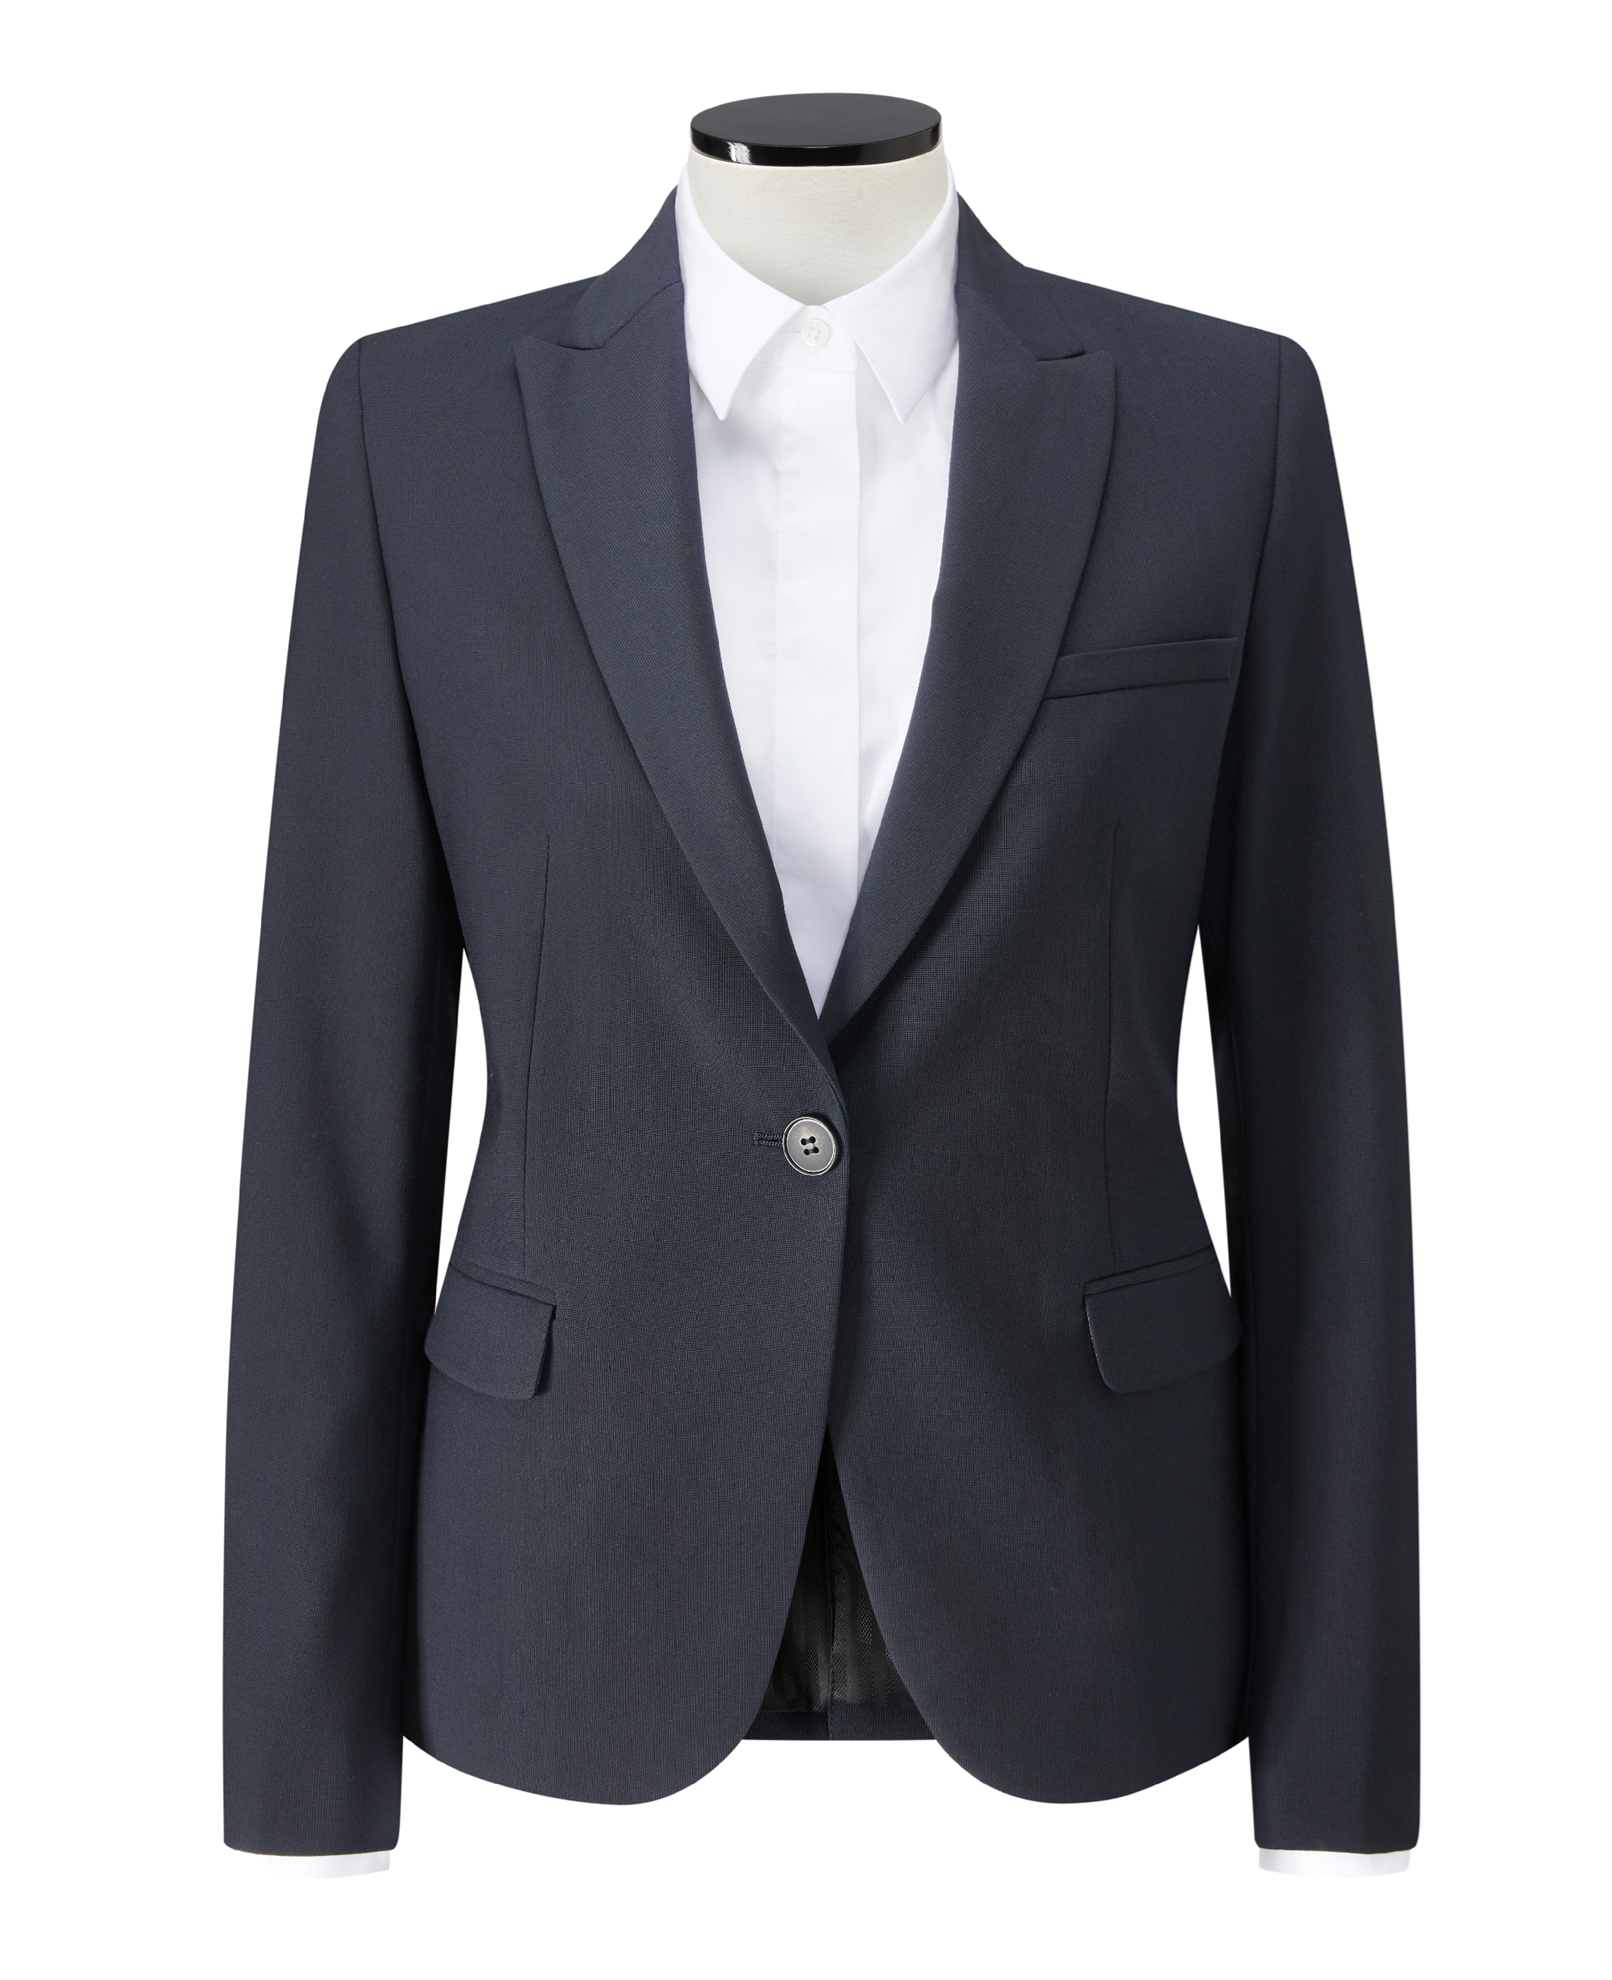 Picture of Ladies Hoxton Slim Fit Jacket - Navy